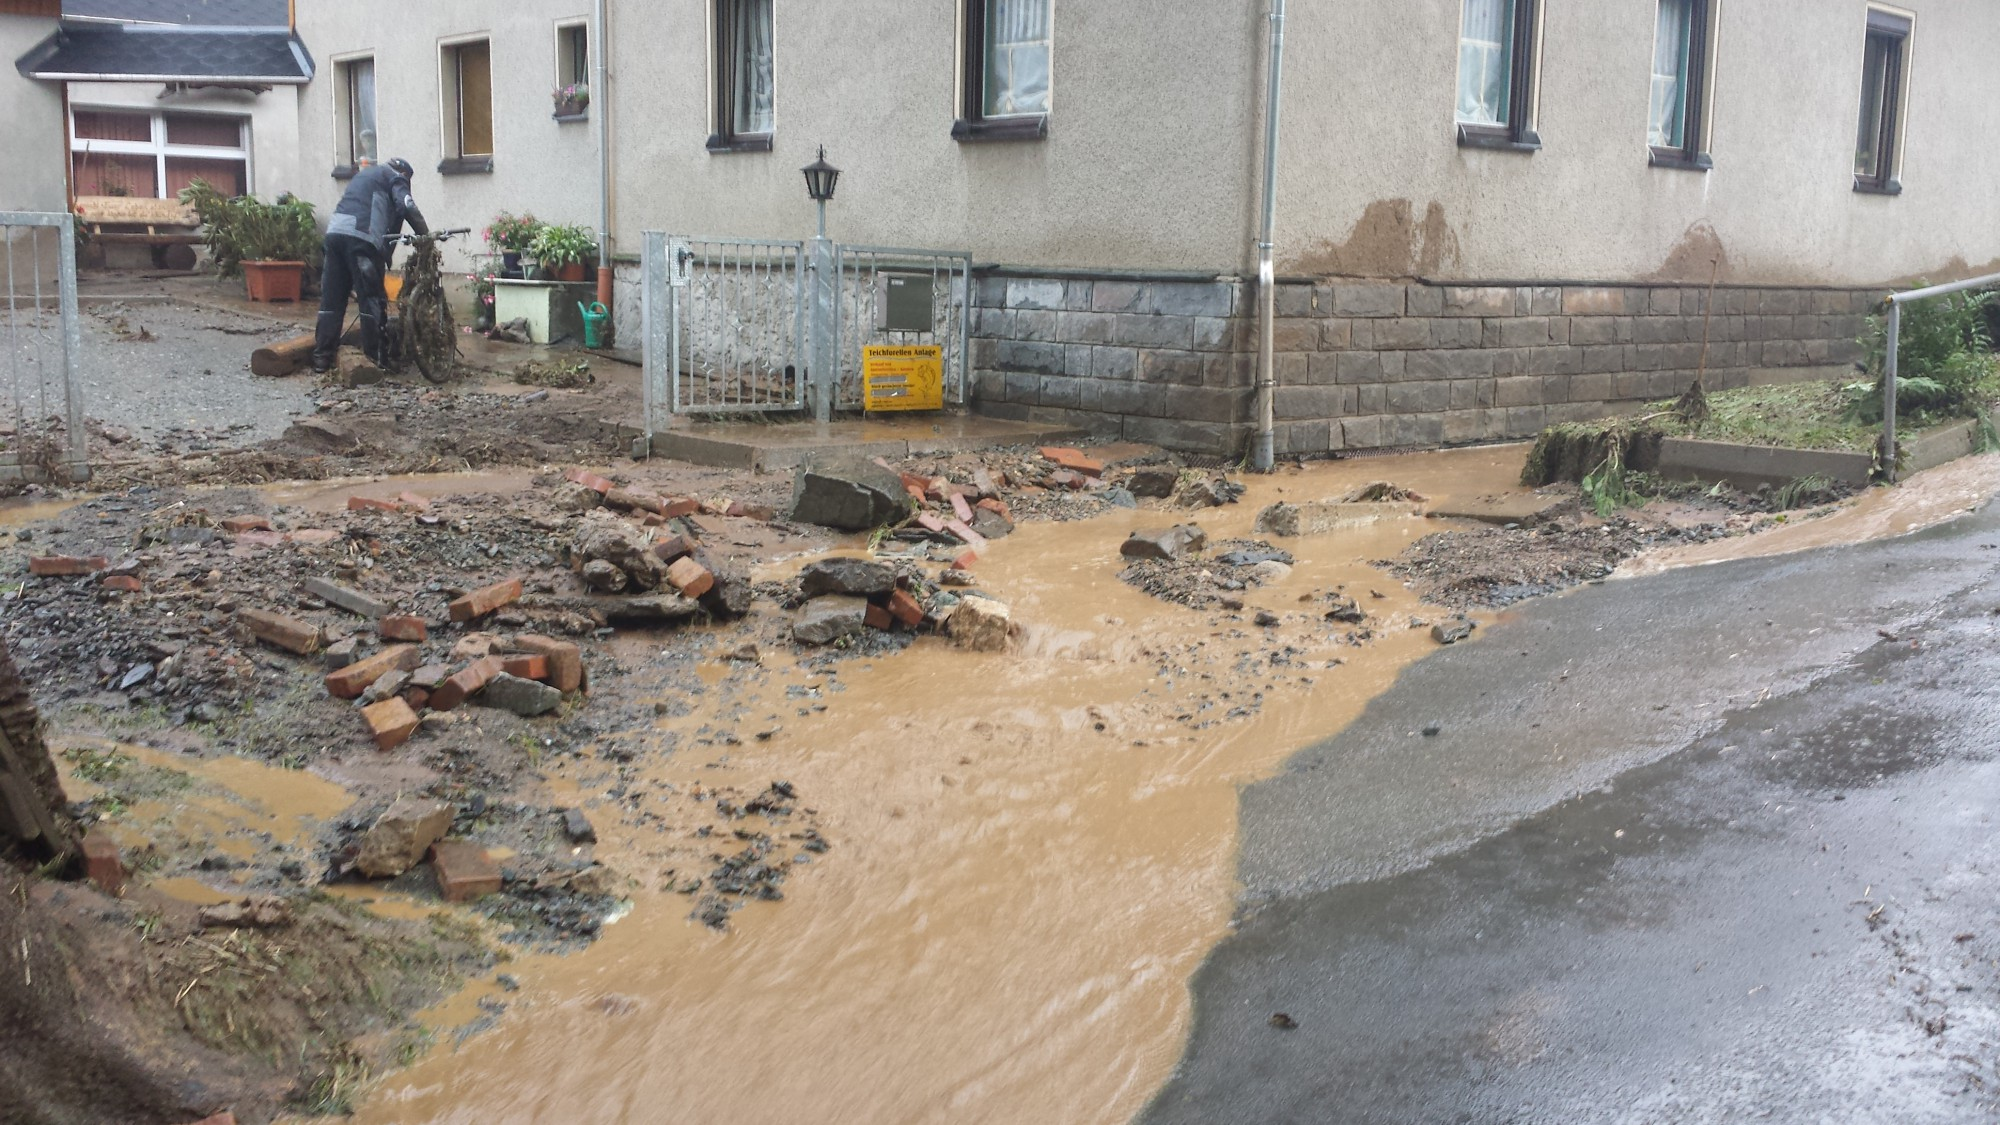 Wetter 08606 Oelsnitz